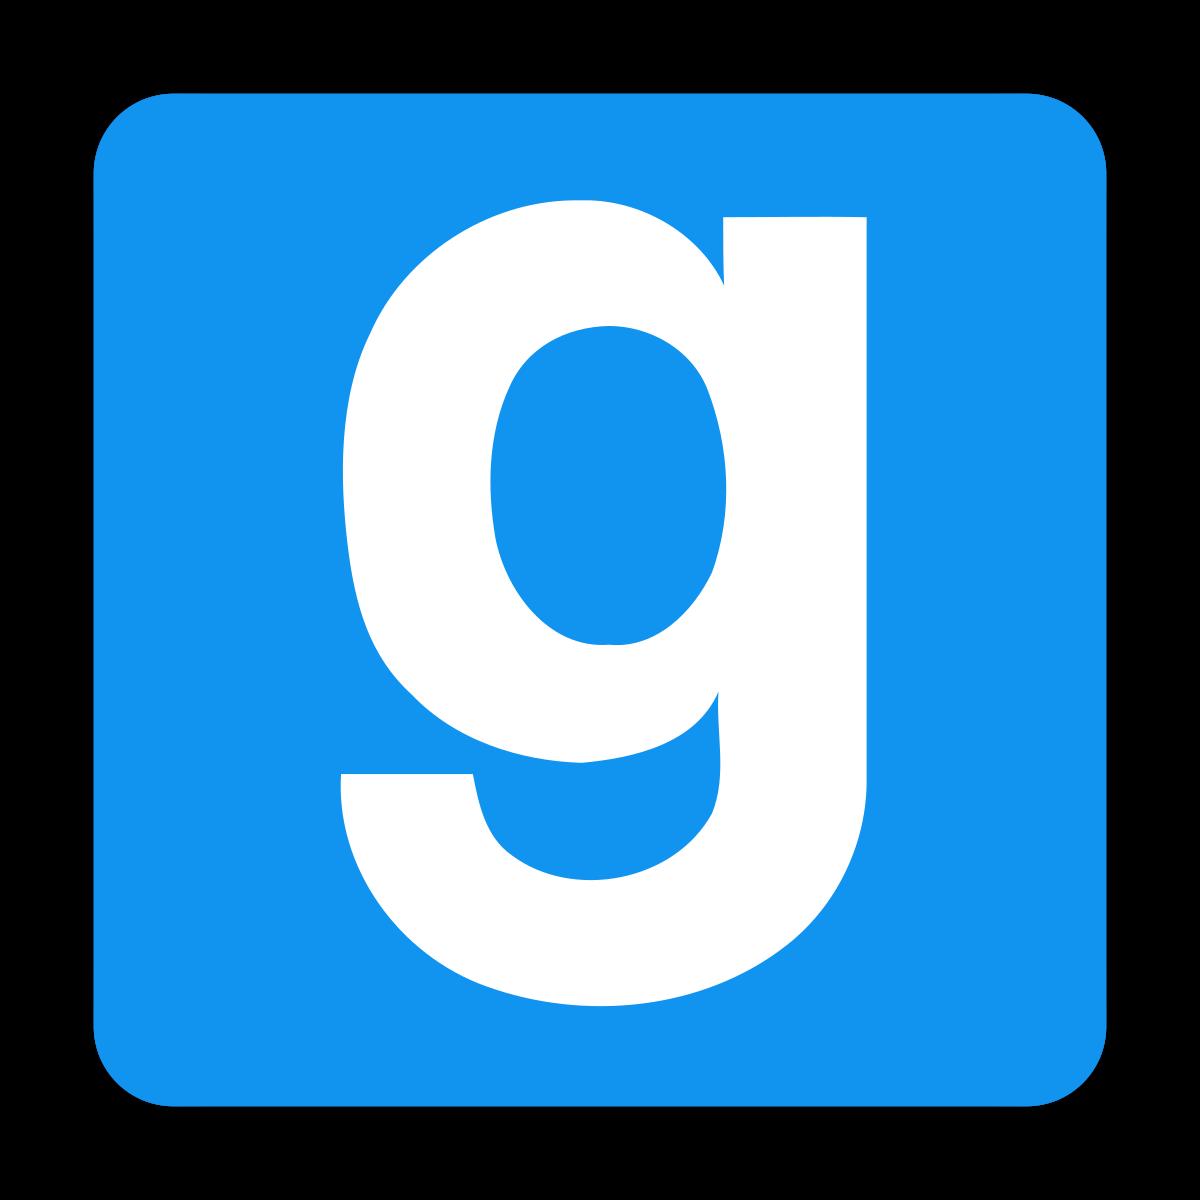 Garry S Mod Wikipedia Game Logo Garry S Mod Mod